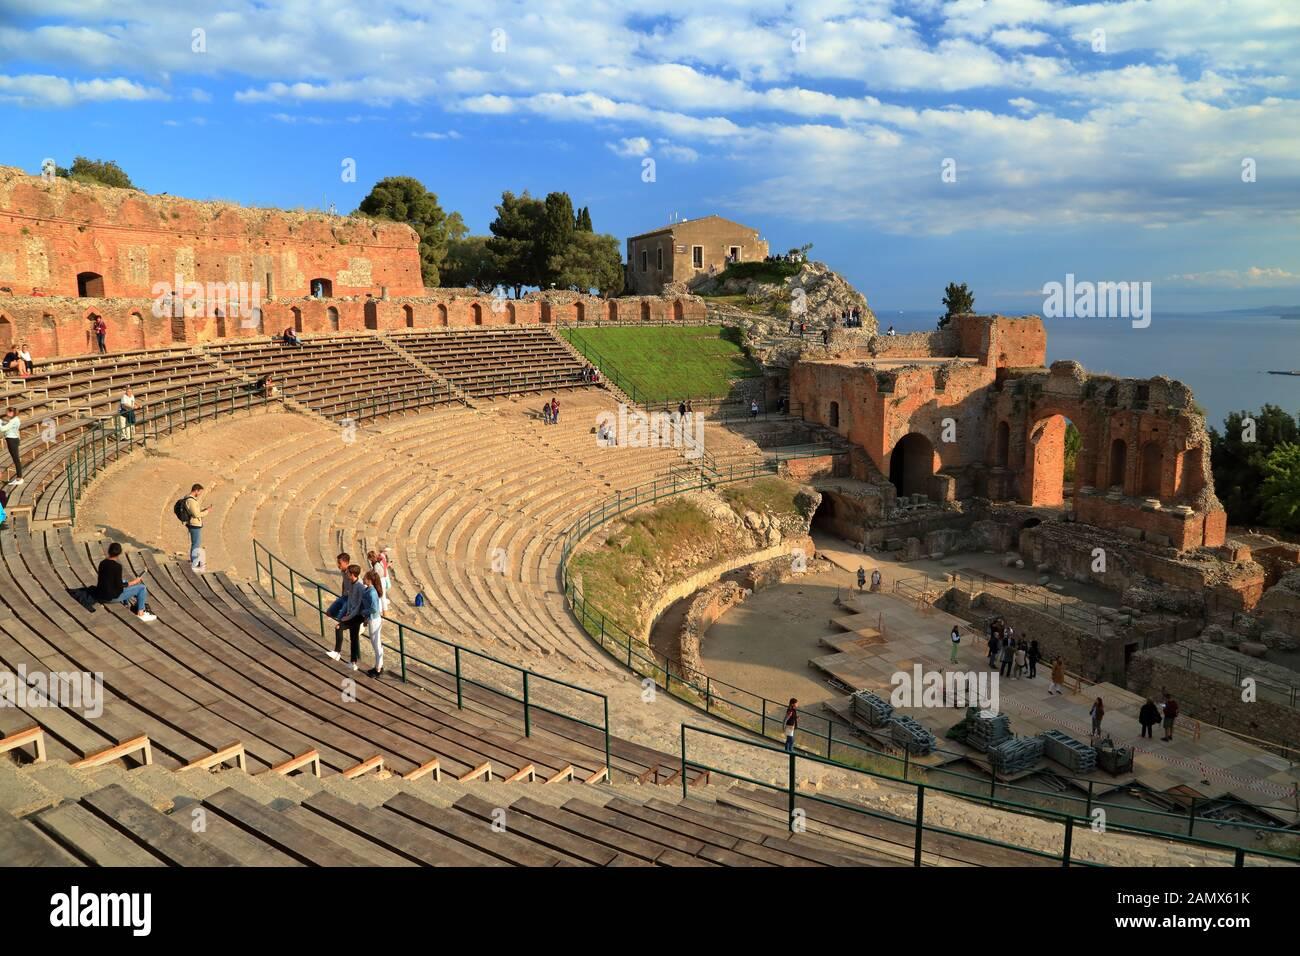 Ancient Greek theatre (Teatro Greco) of Taormina. Teatro antico di Taormina Stock Photo